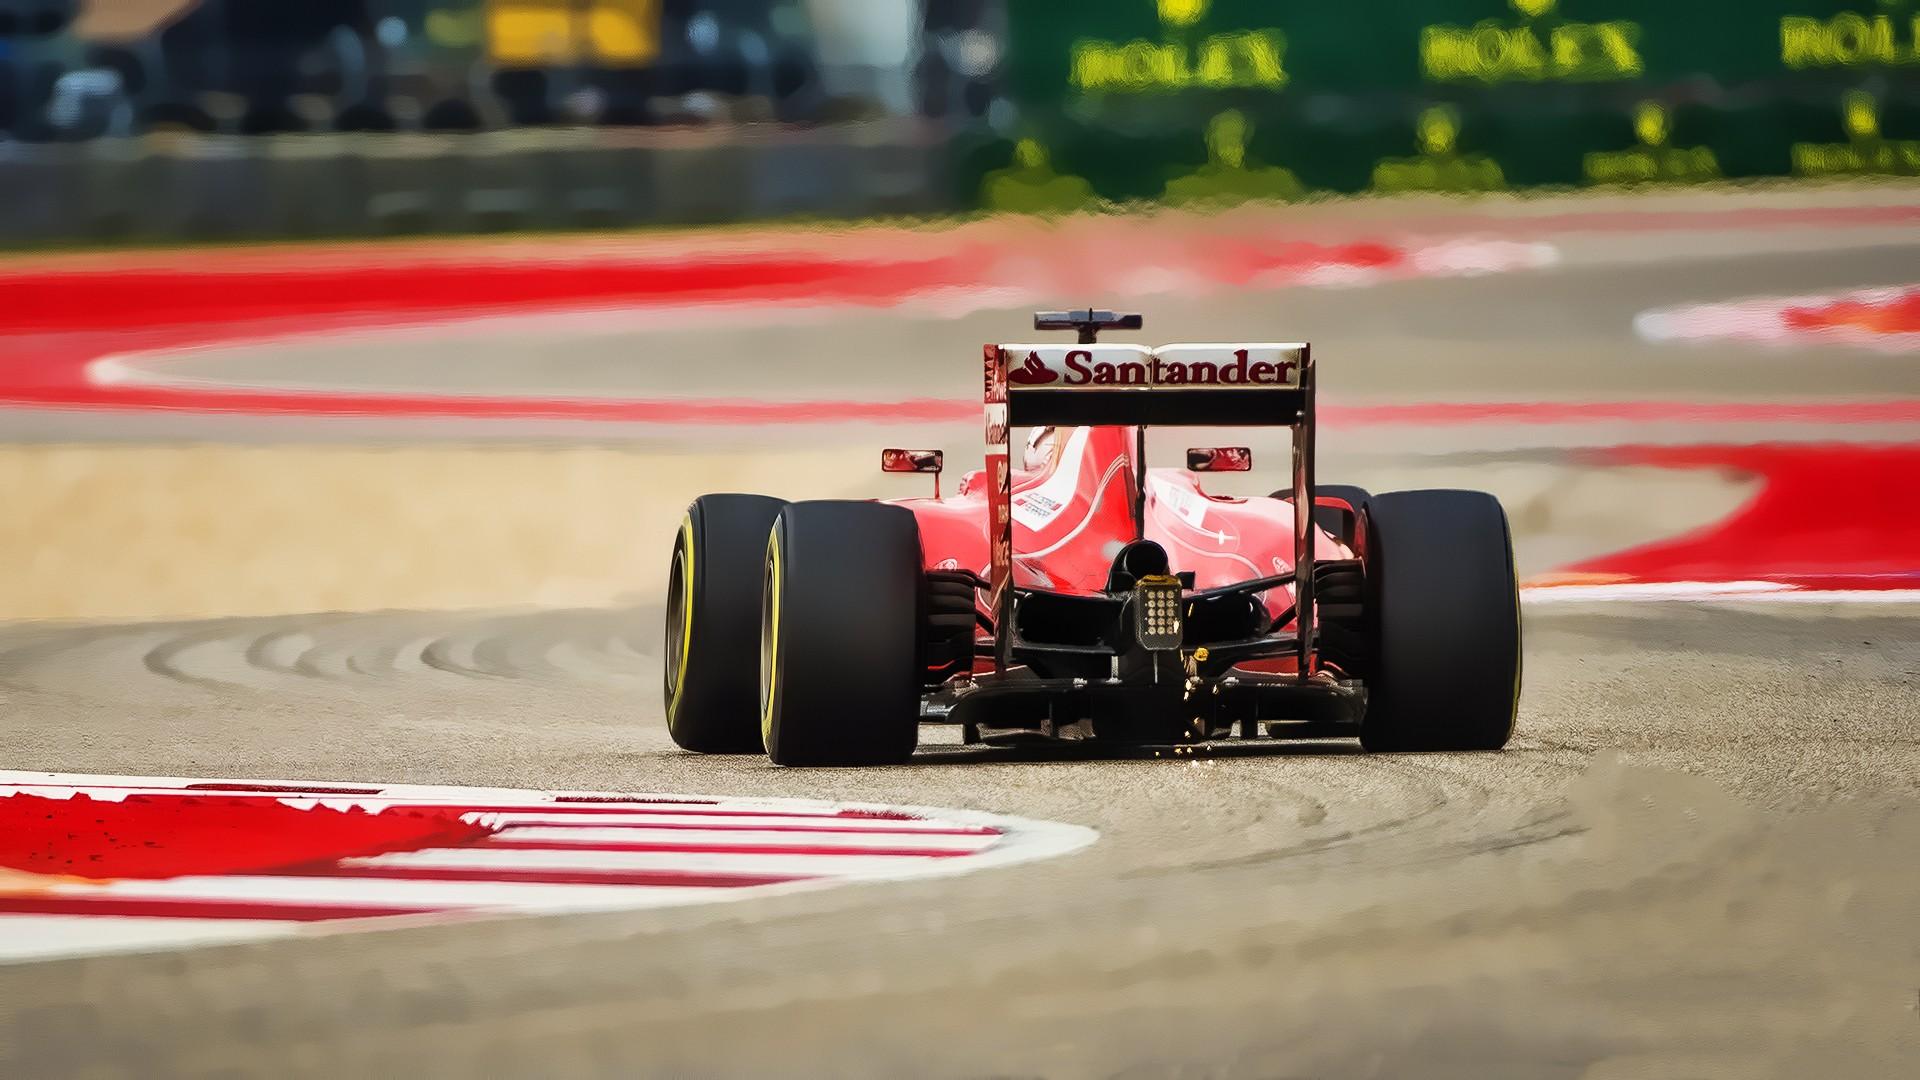 Wallpaper : Sports, Vehicle, Formula 1, Ferrari, Structure, Supercar,  Motorsport, Sport Venue, Automotive Design, Race Car, Race Track, Auto  Racing, ...